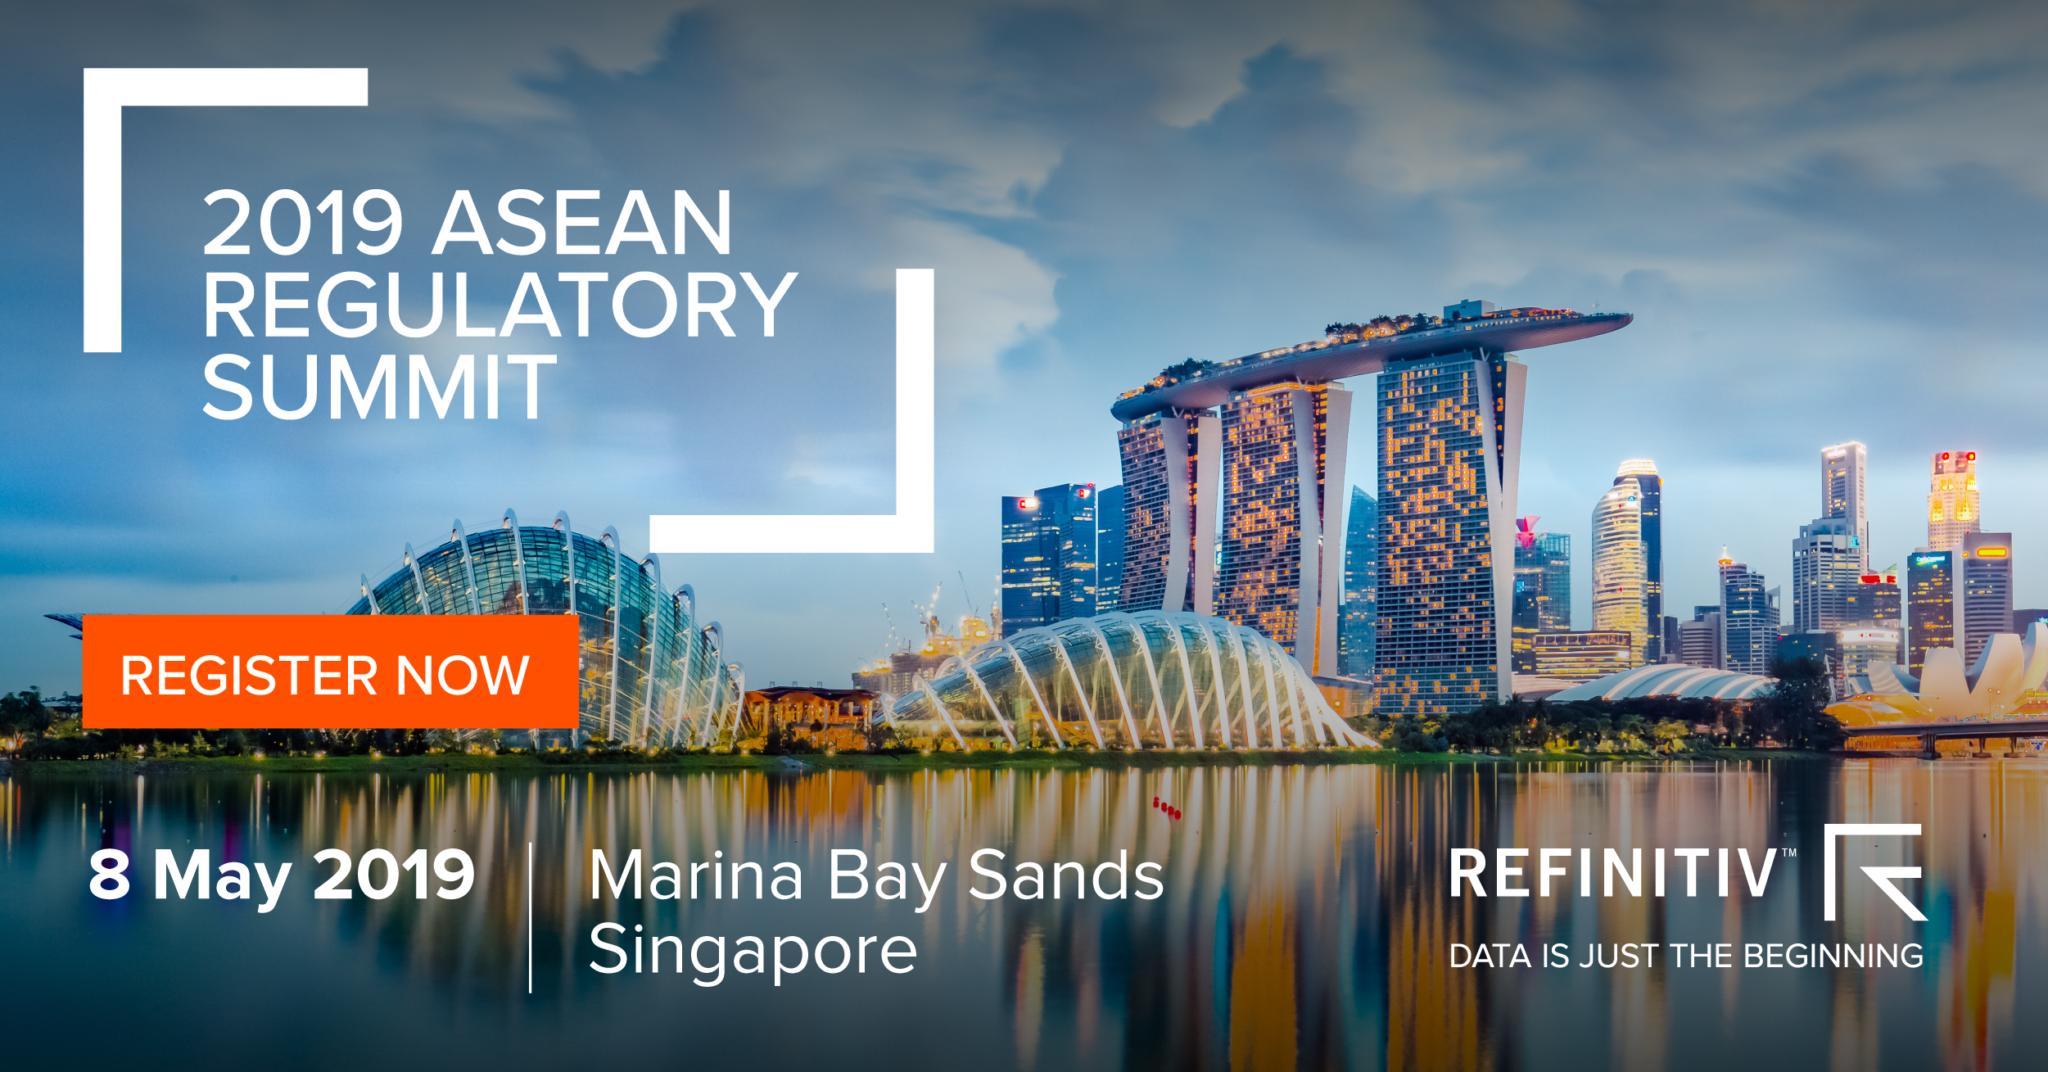 2019 ASEAN Regulatory Summit